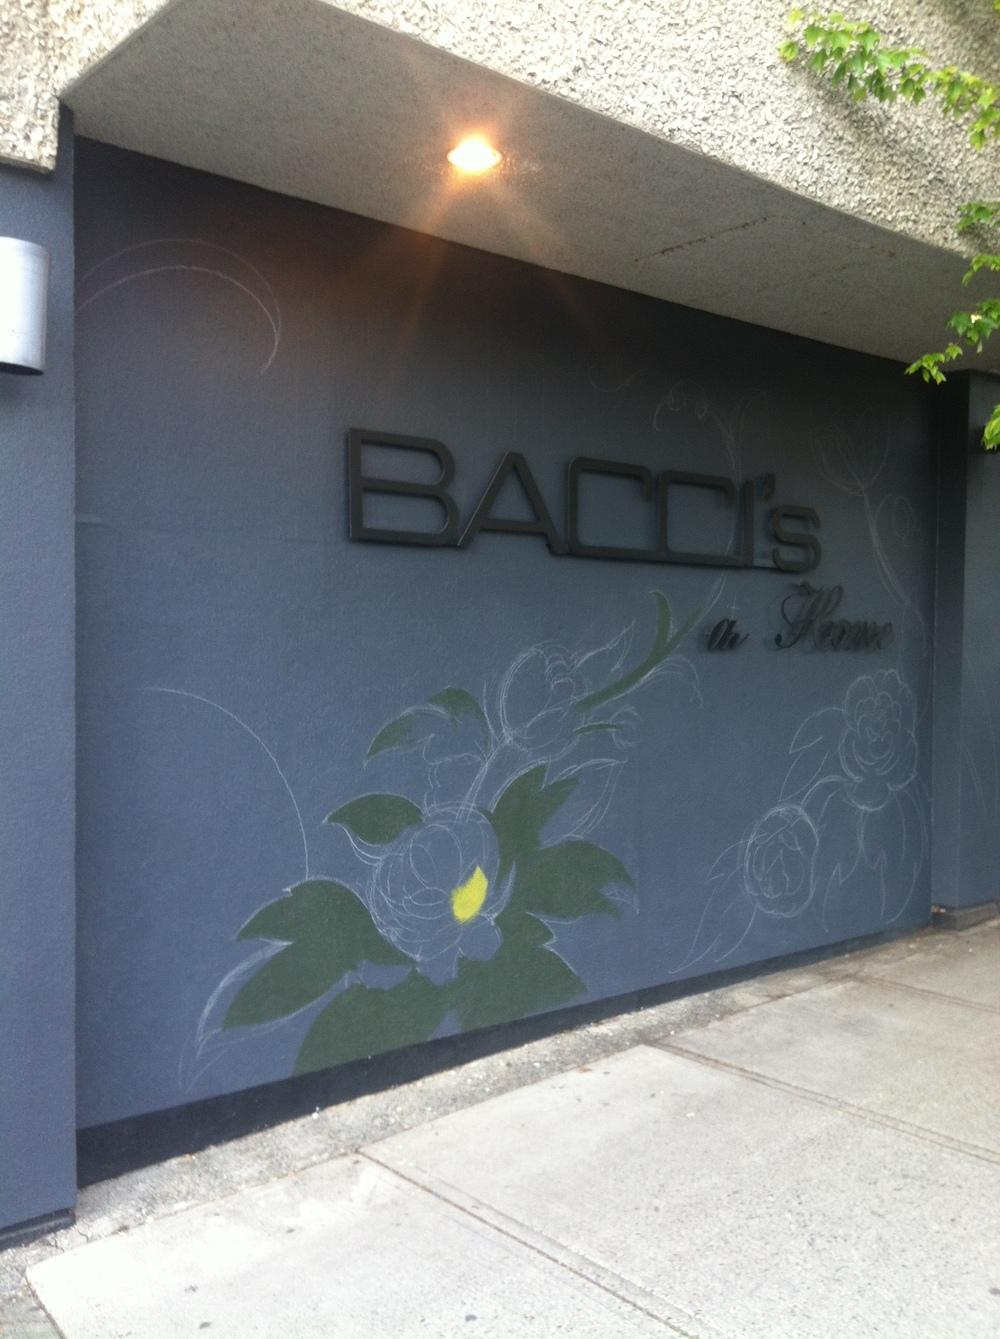 Bacci's mid makeover